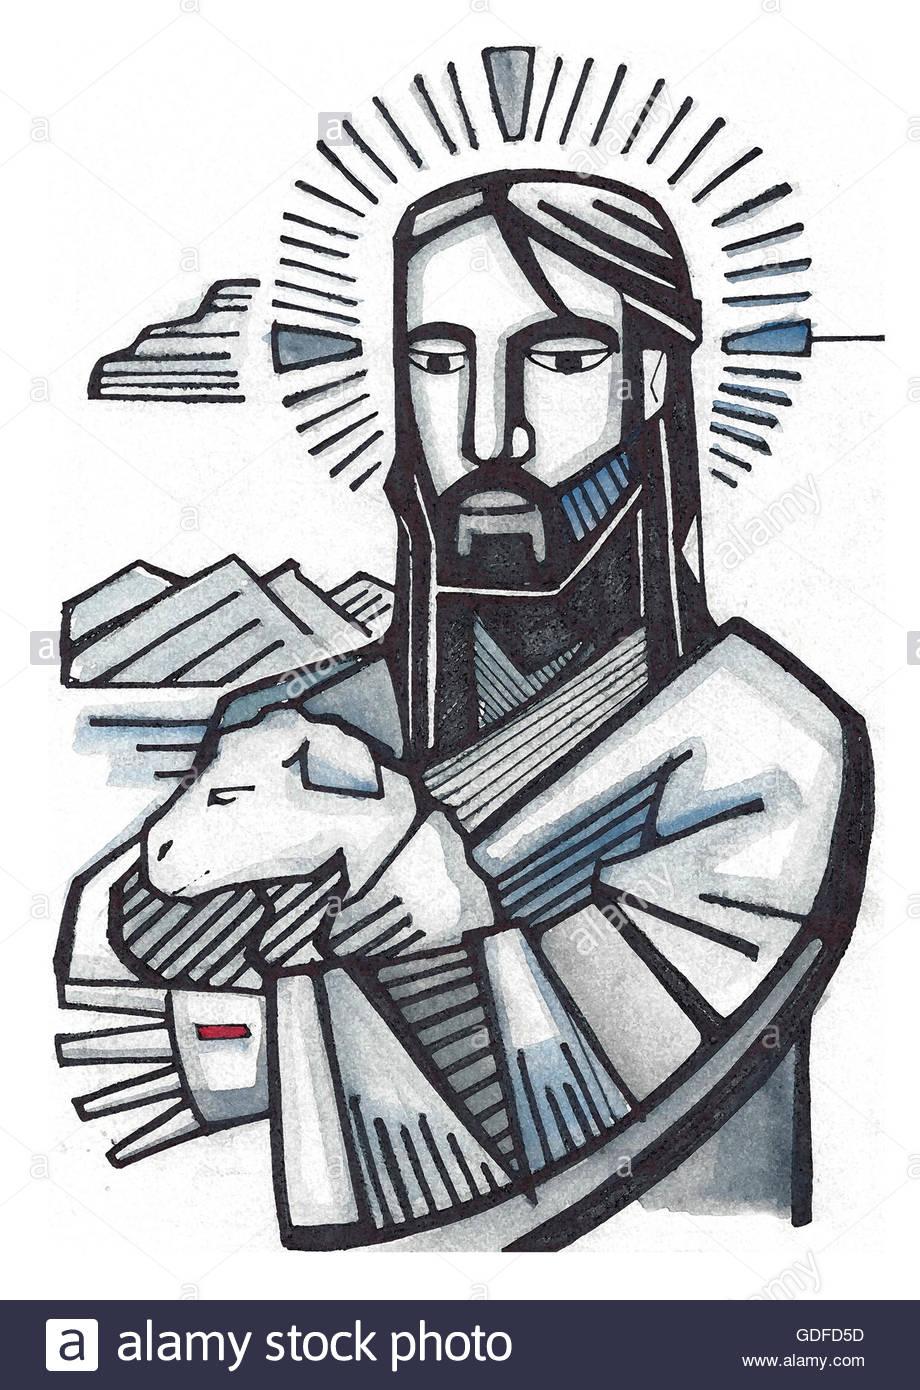 920x1390 Hand Drawn Illustration Or Drawing Of Jesus As Good Shepherd Stock